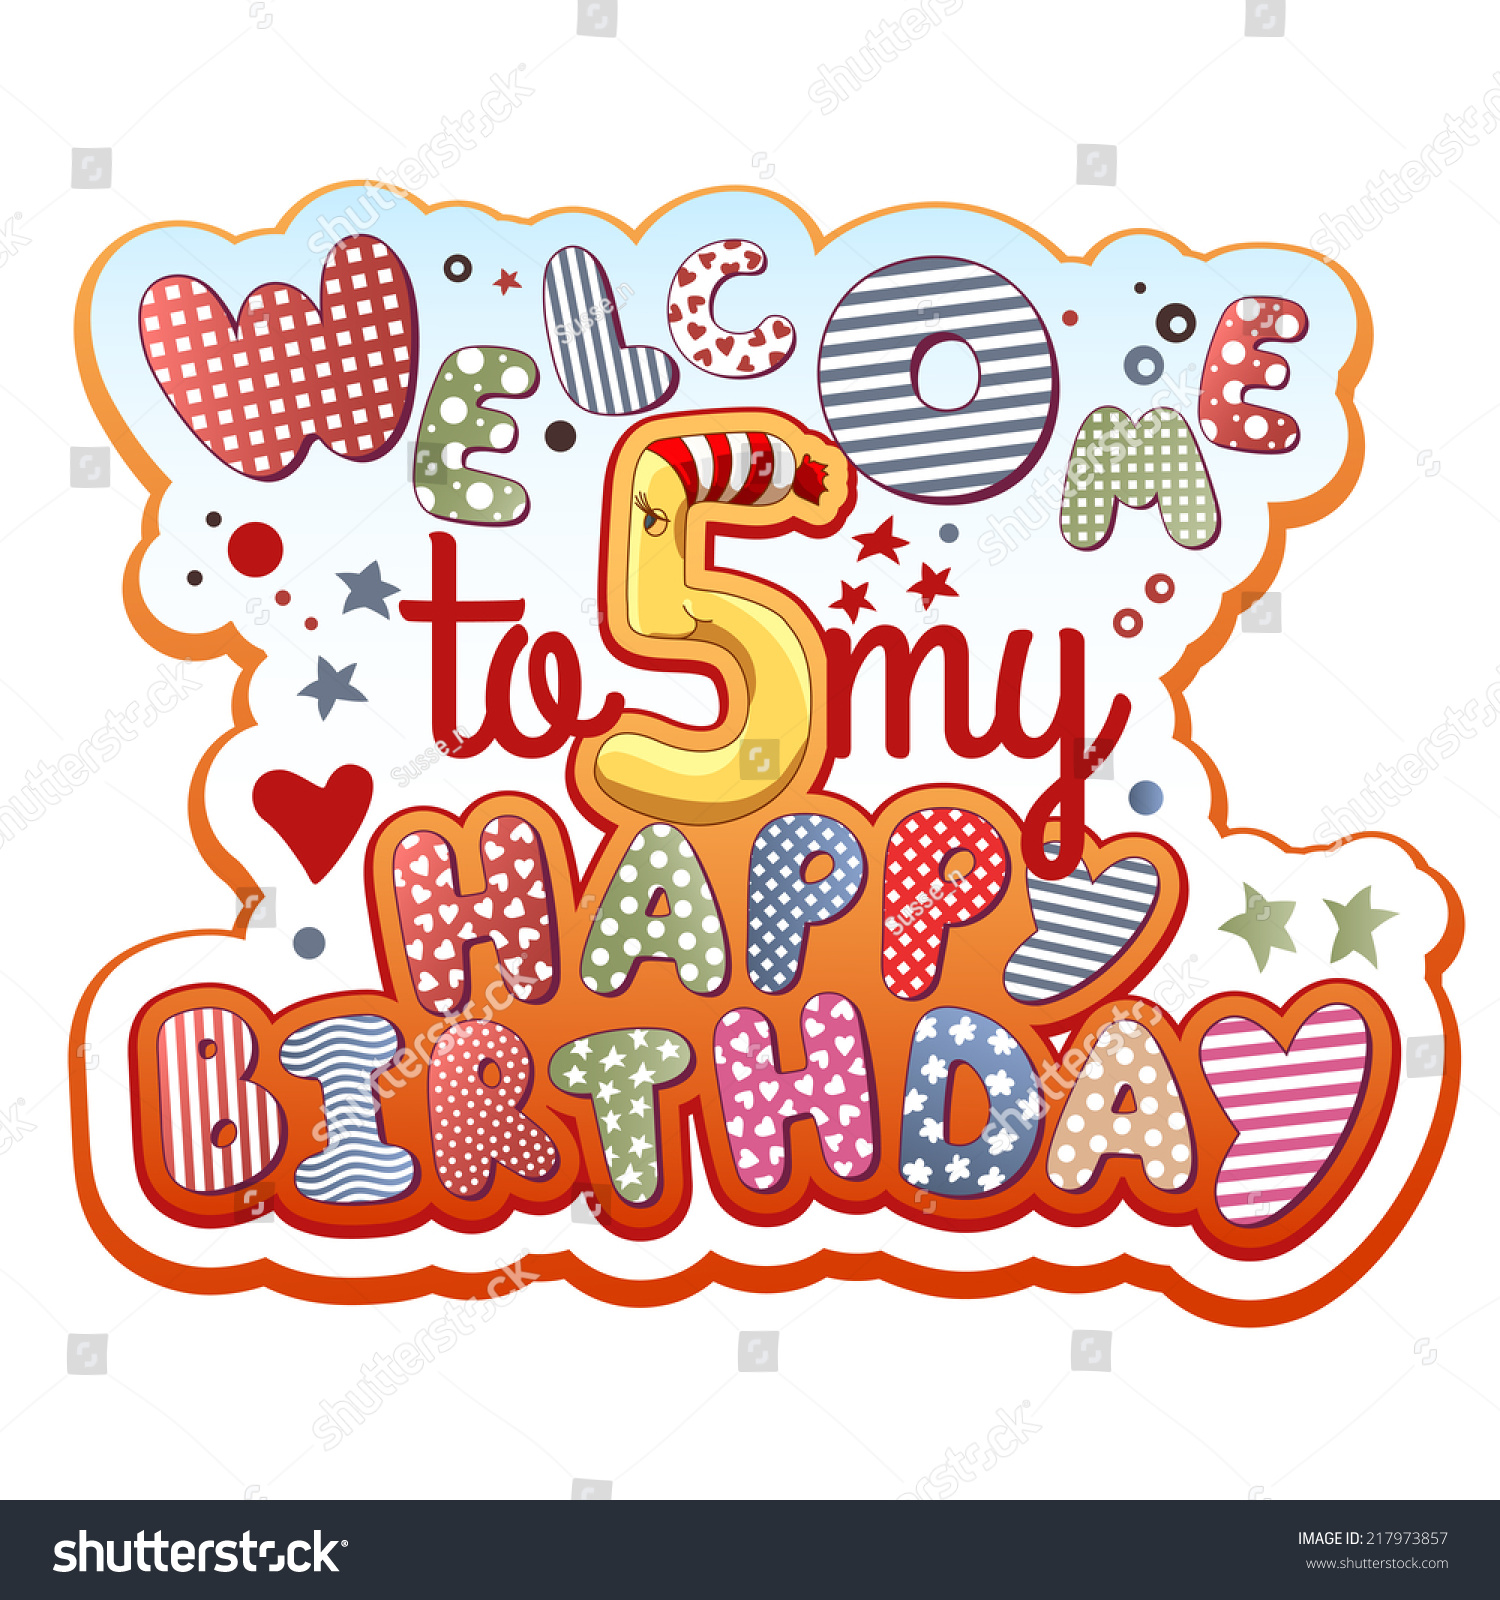 Birthday Invitation Card - 5 years old